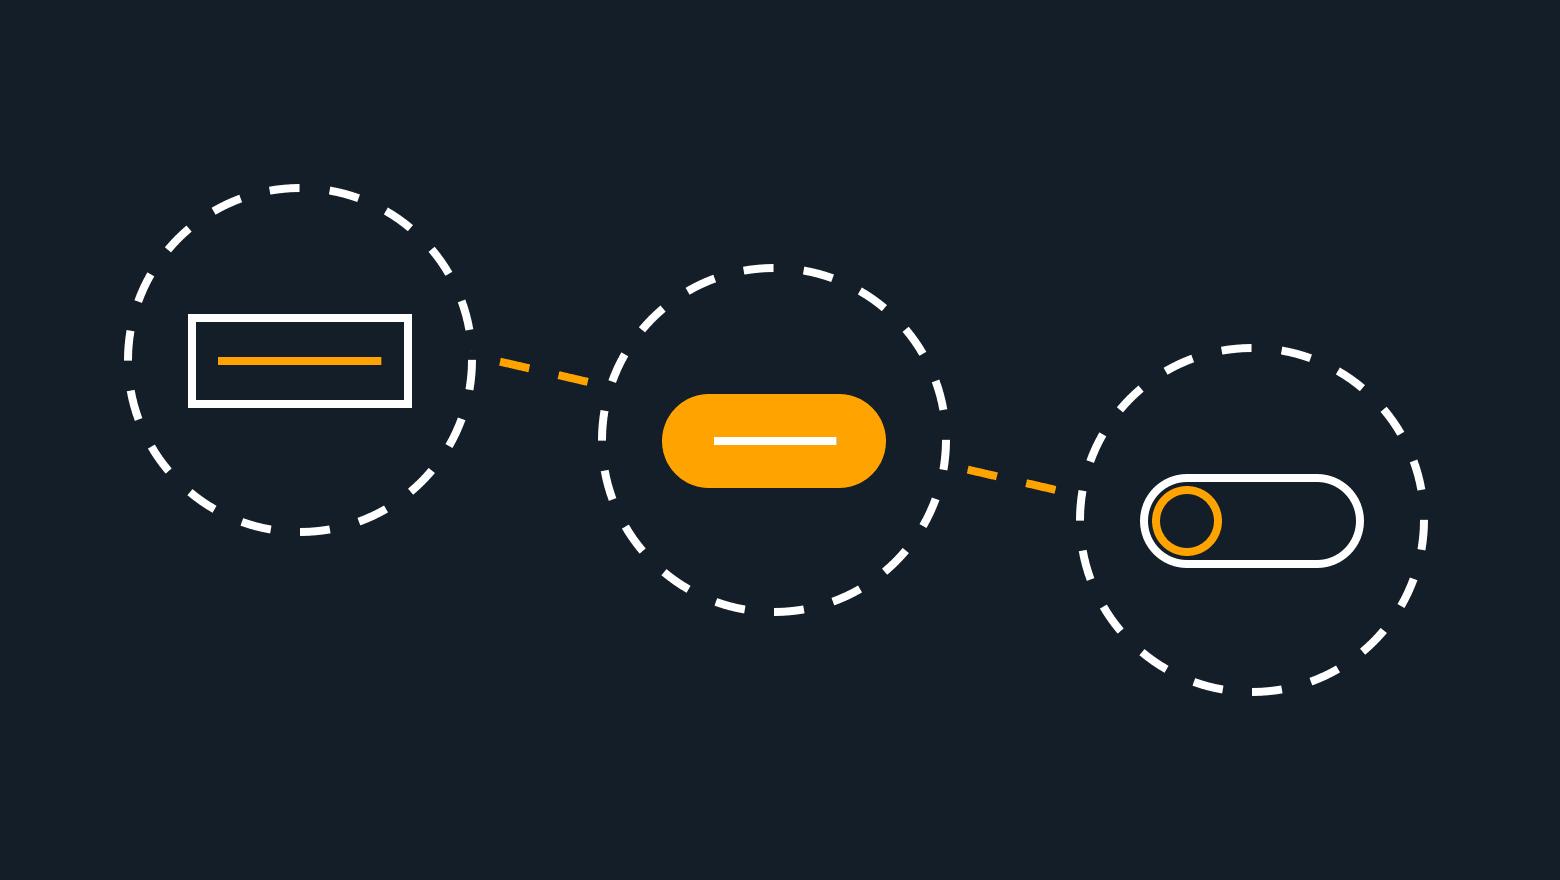 website button designs icon